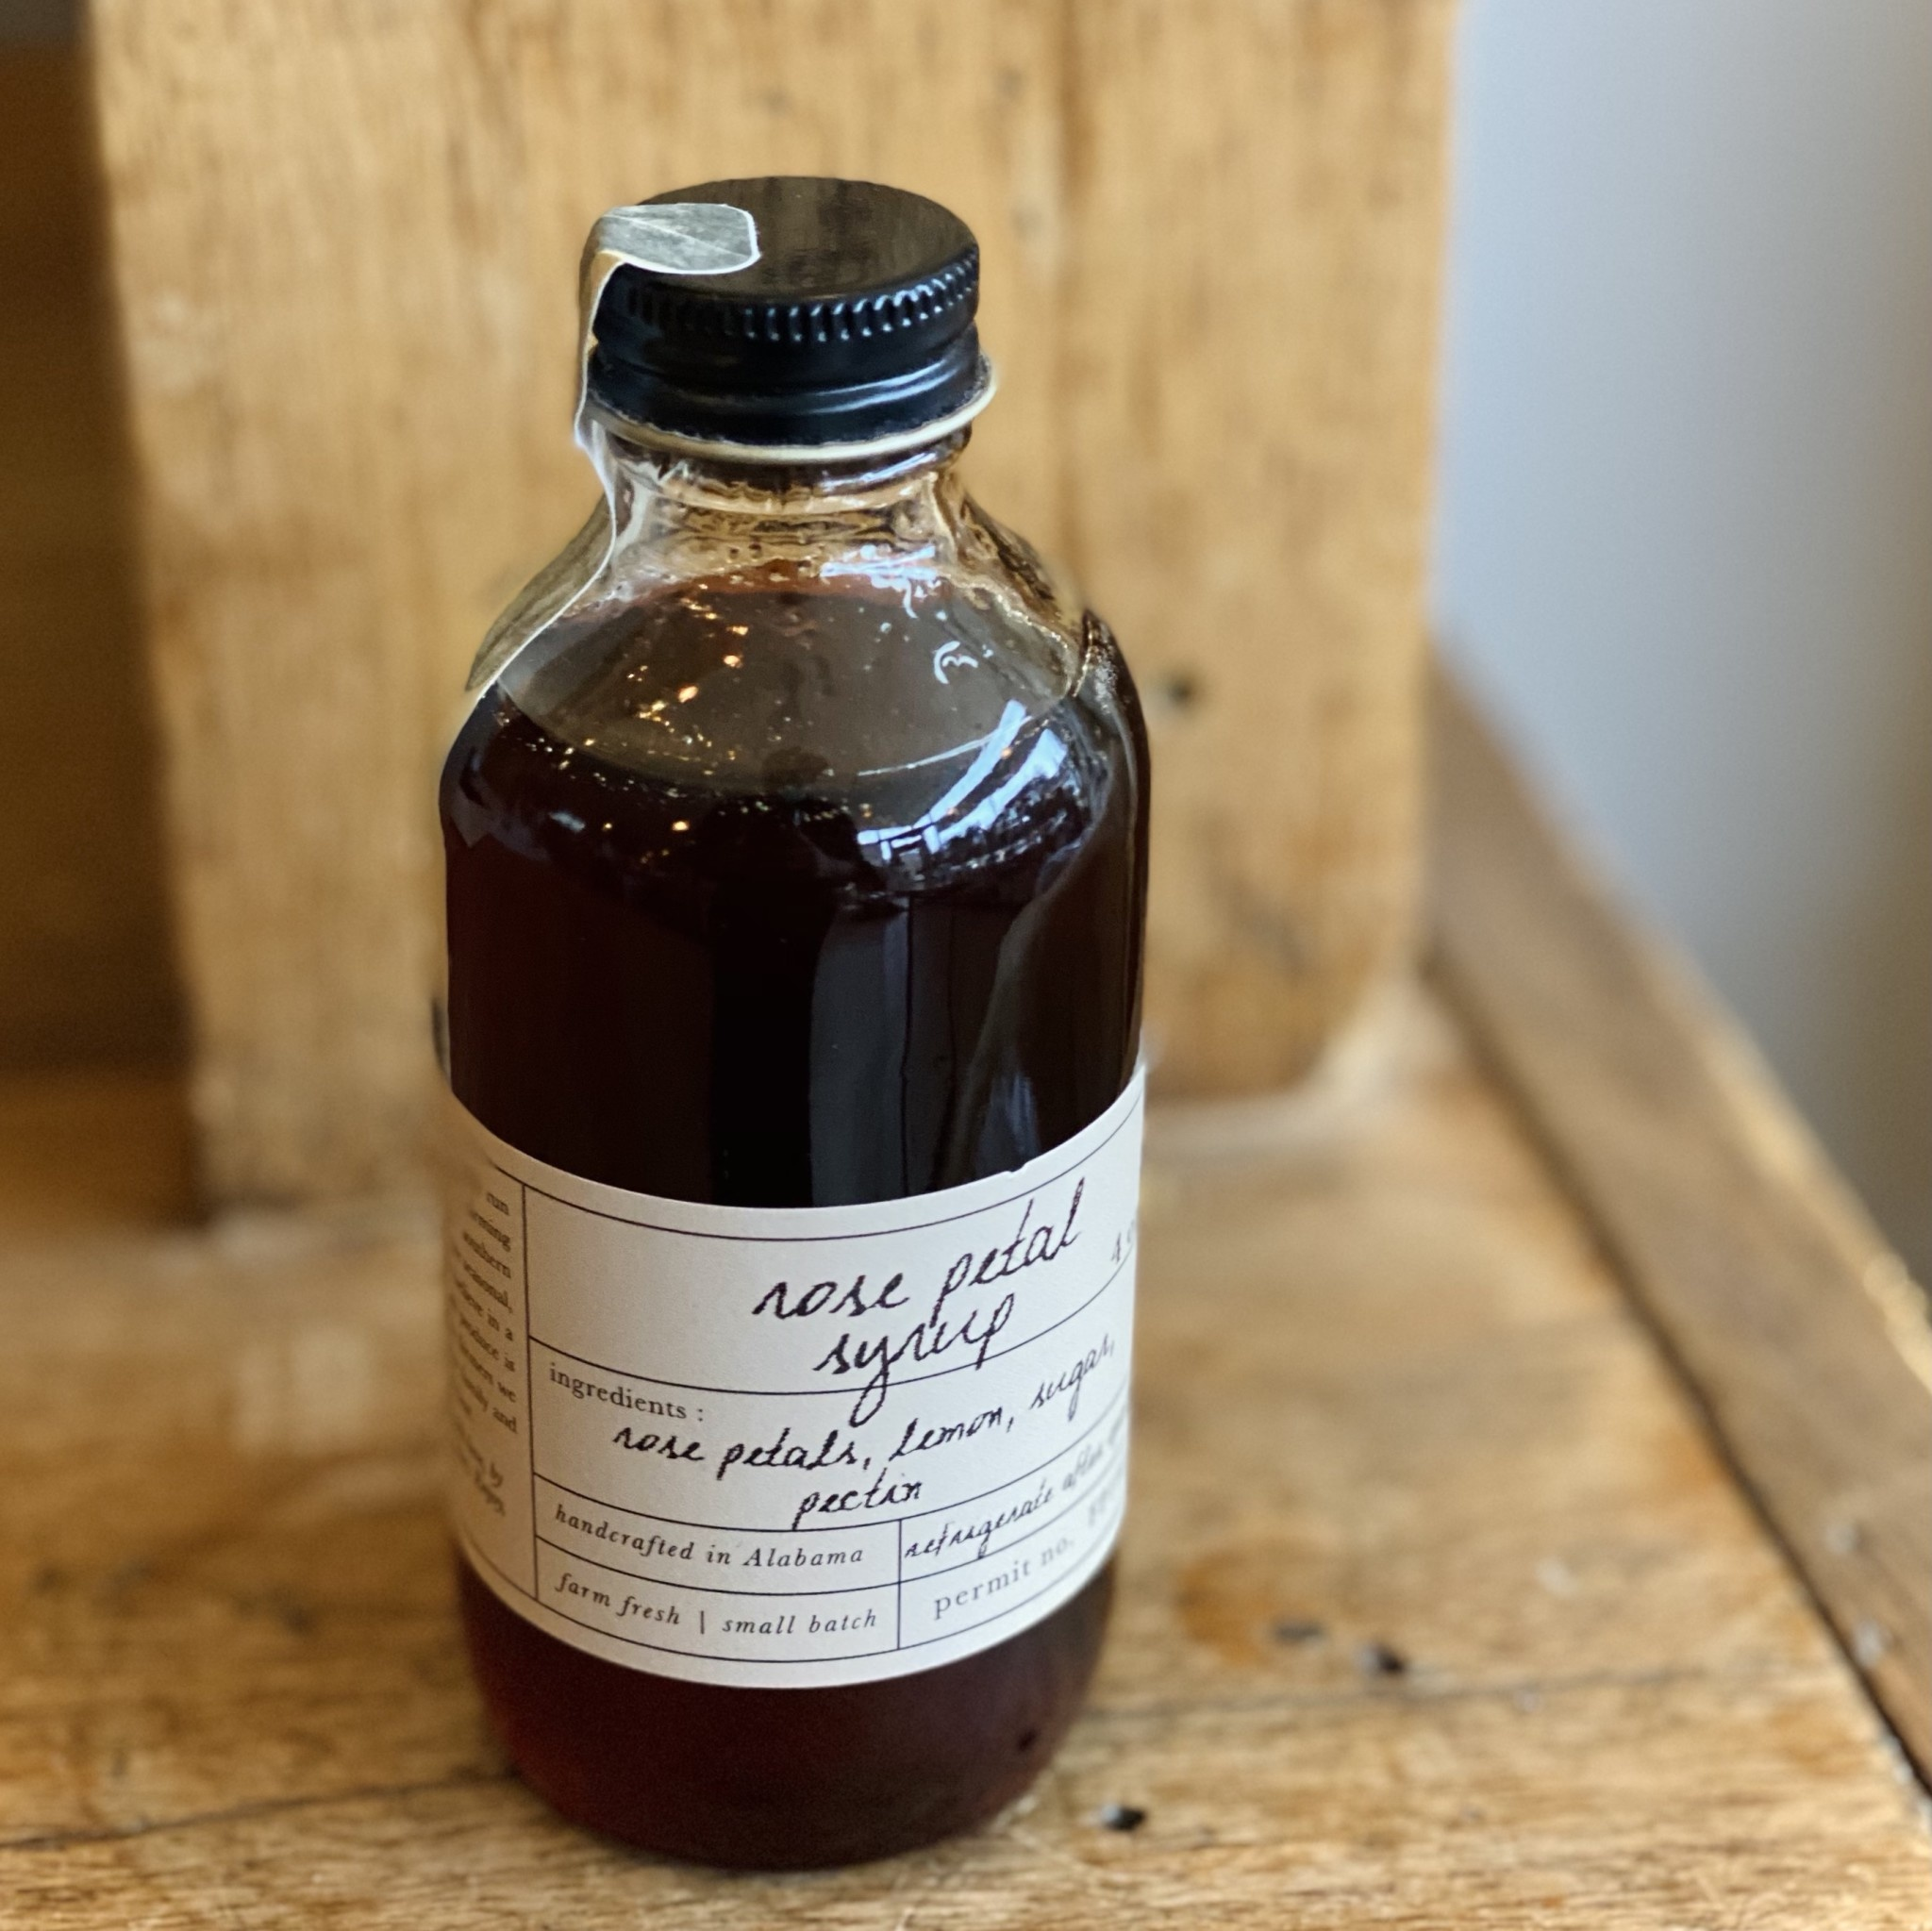 Stone Hollow Farmstead Rose Petal Syrup